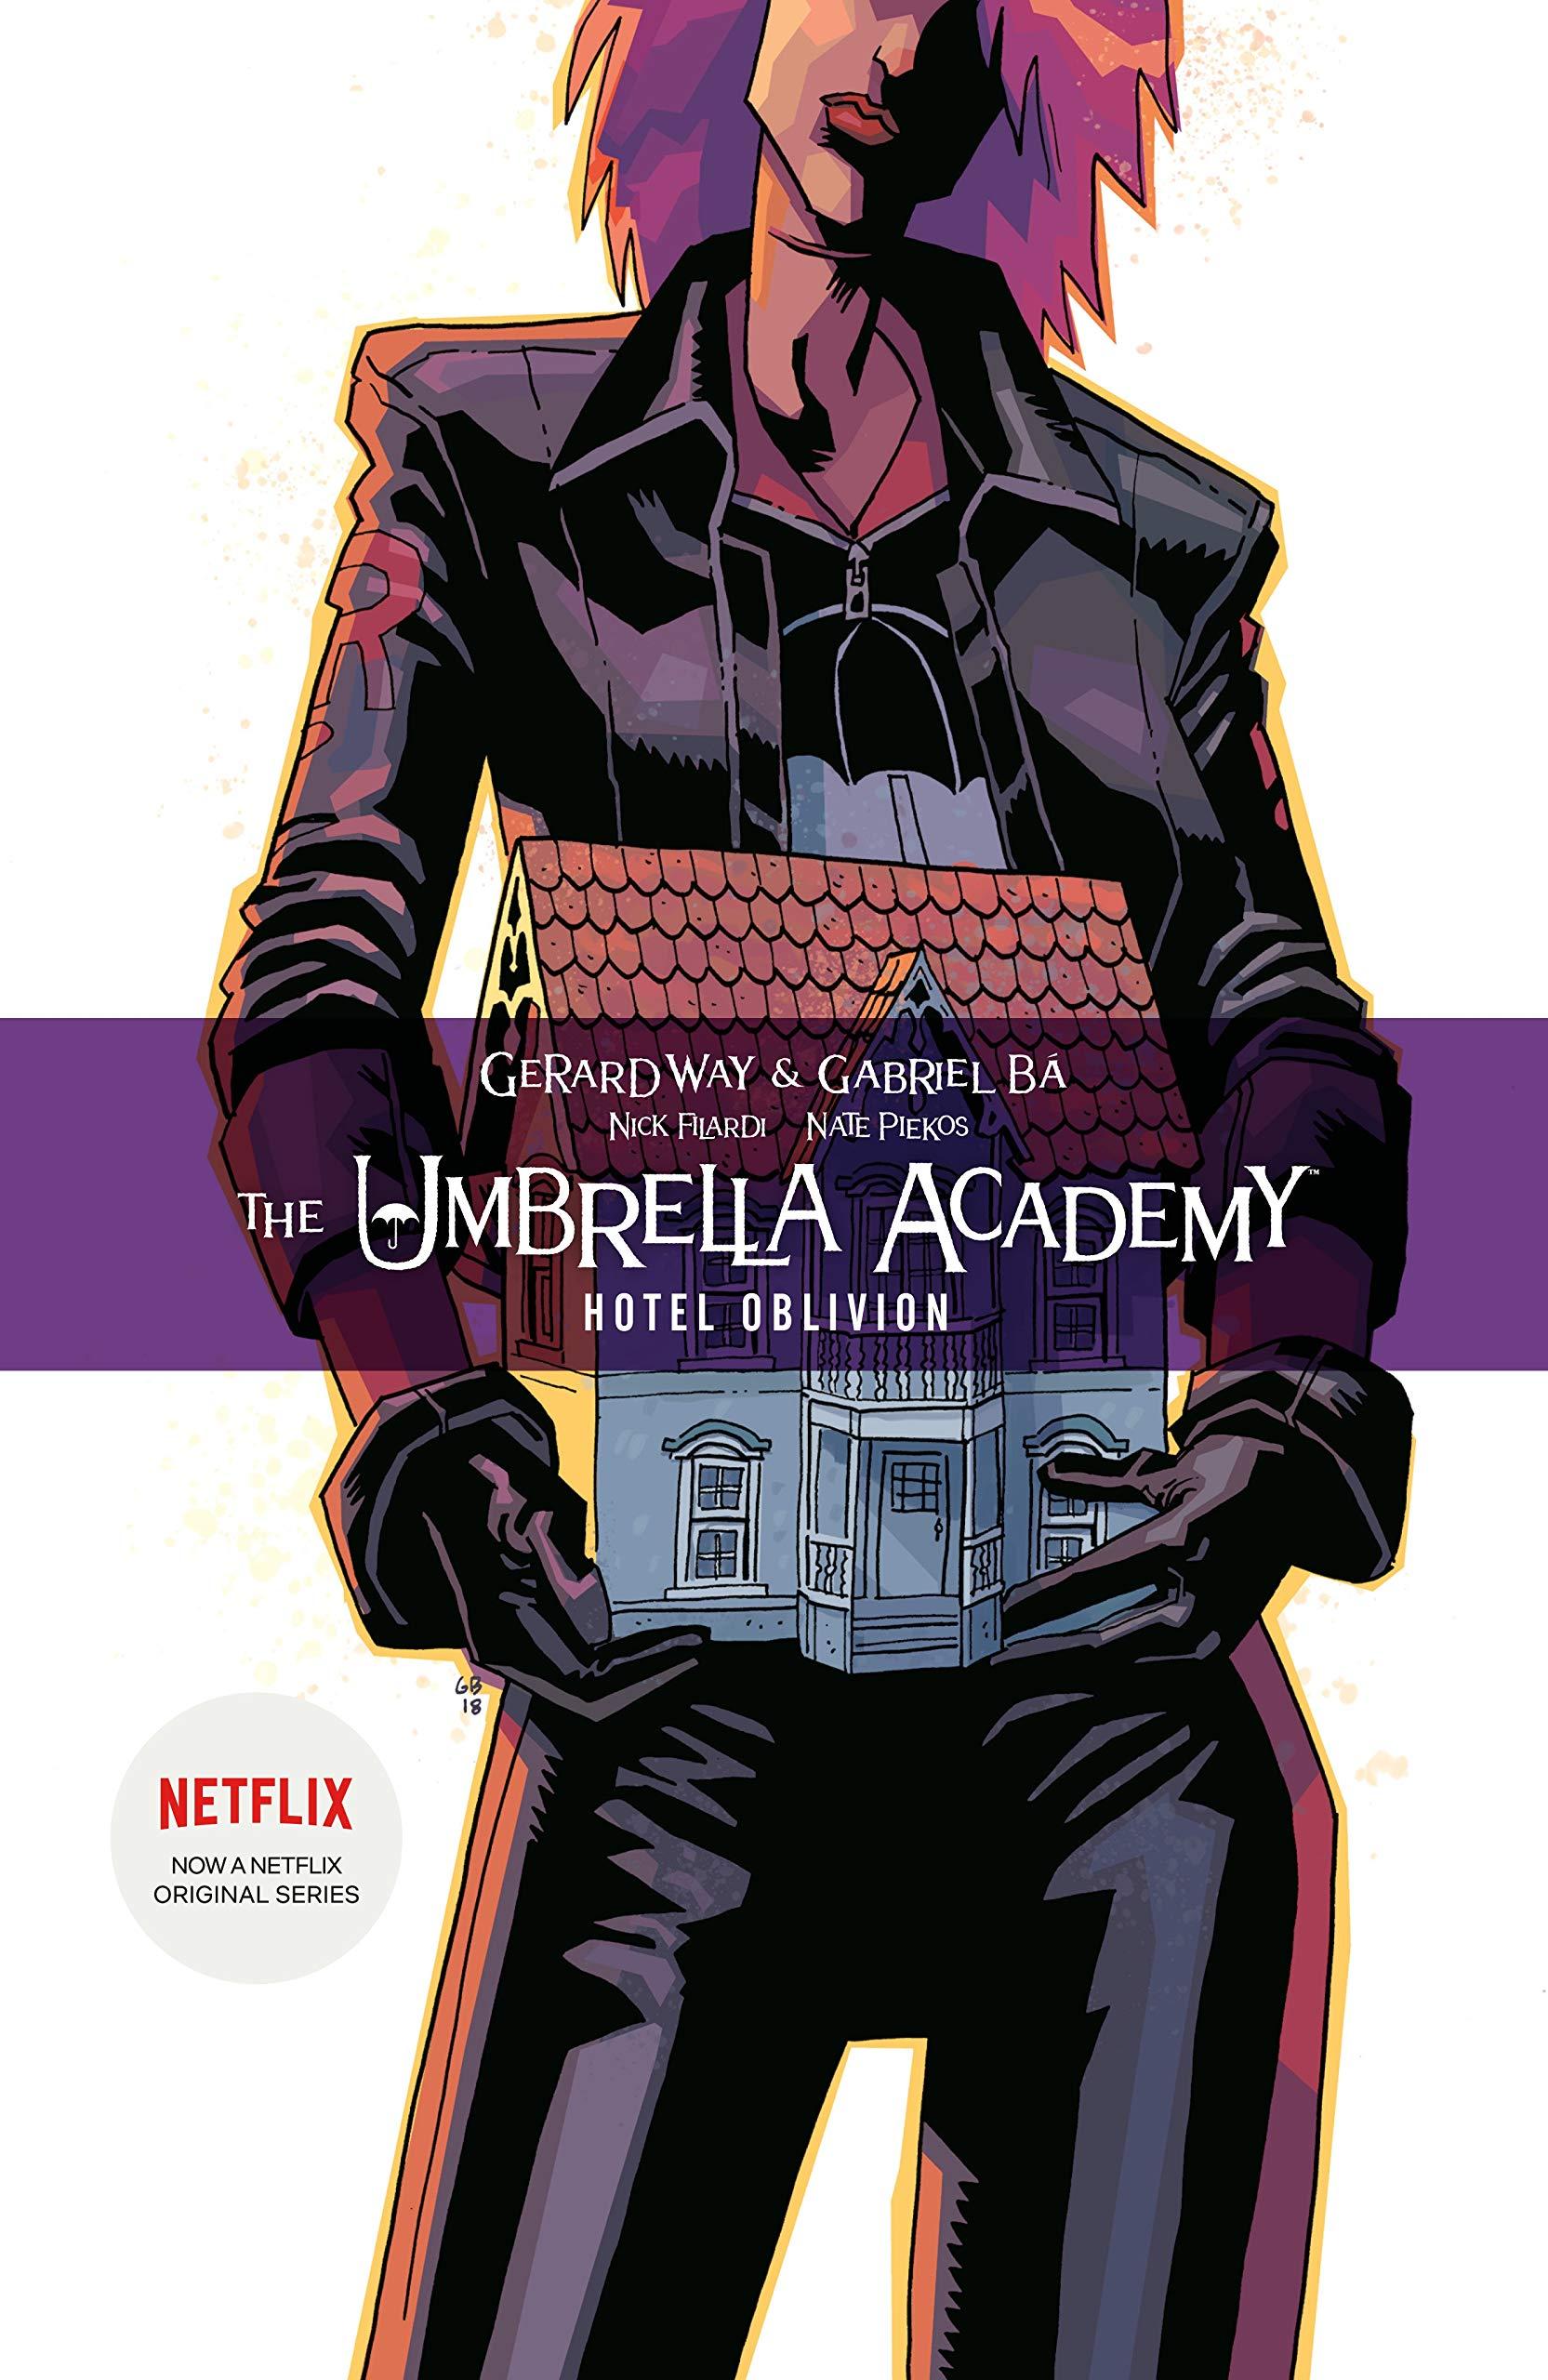 The Umbrella Academy dvd set 1-2